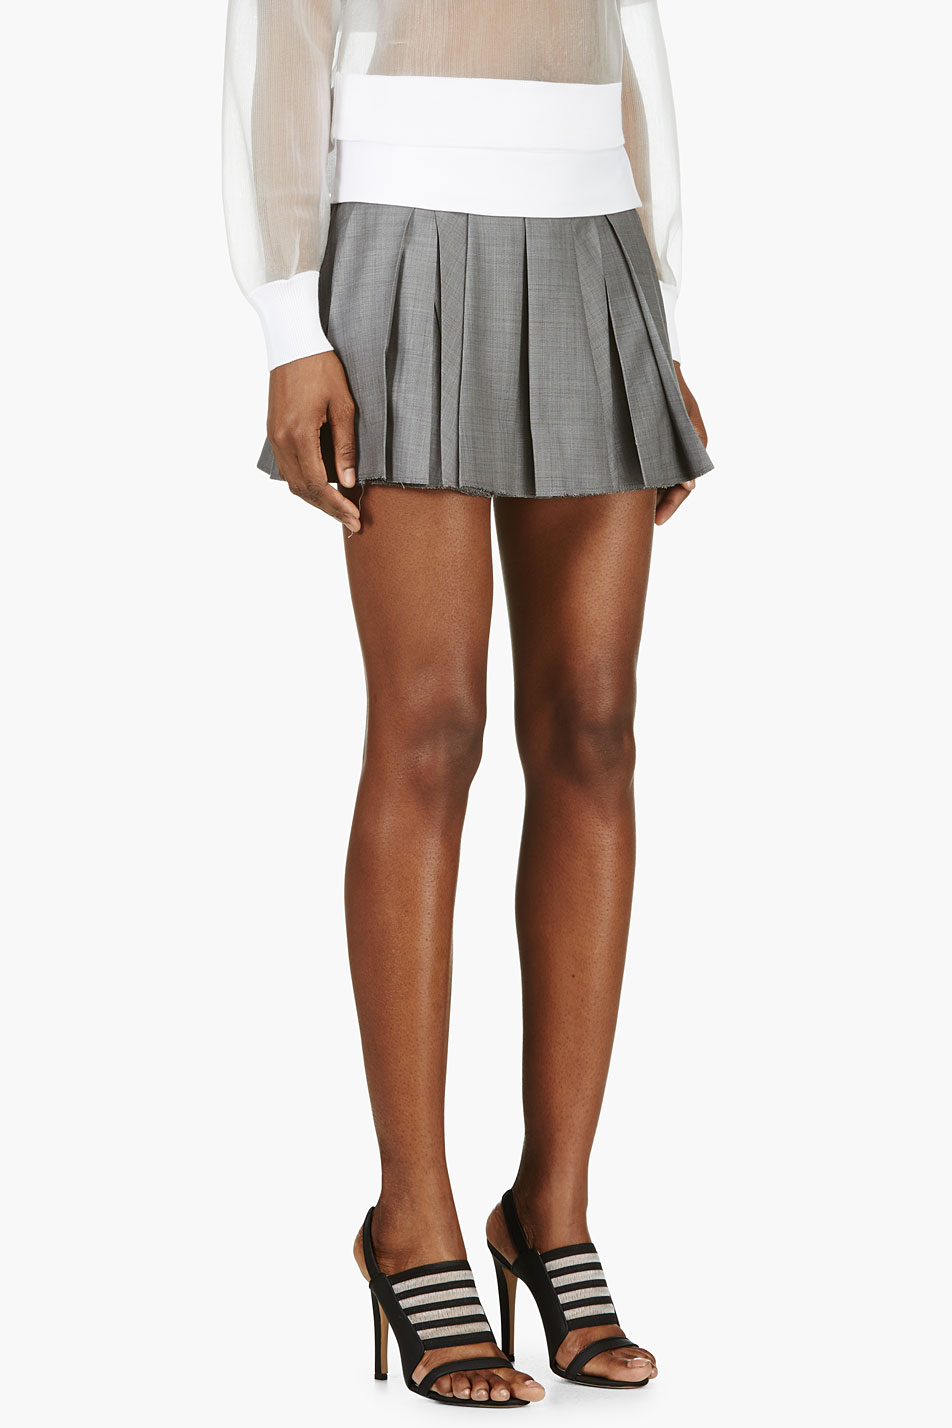 Alexander wang Grey Wool Crosshatch Pleated Mini Skirt in Gray | Lyst